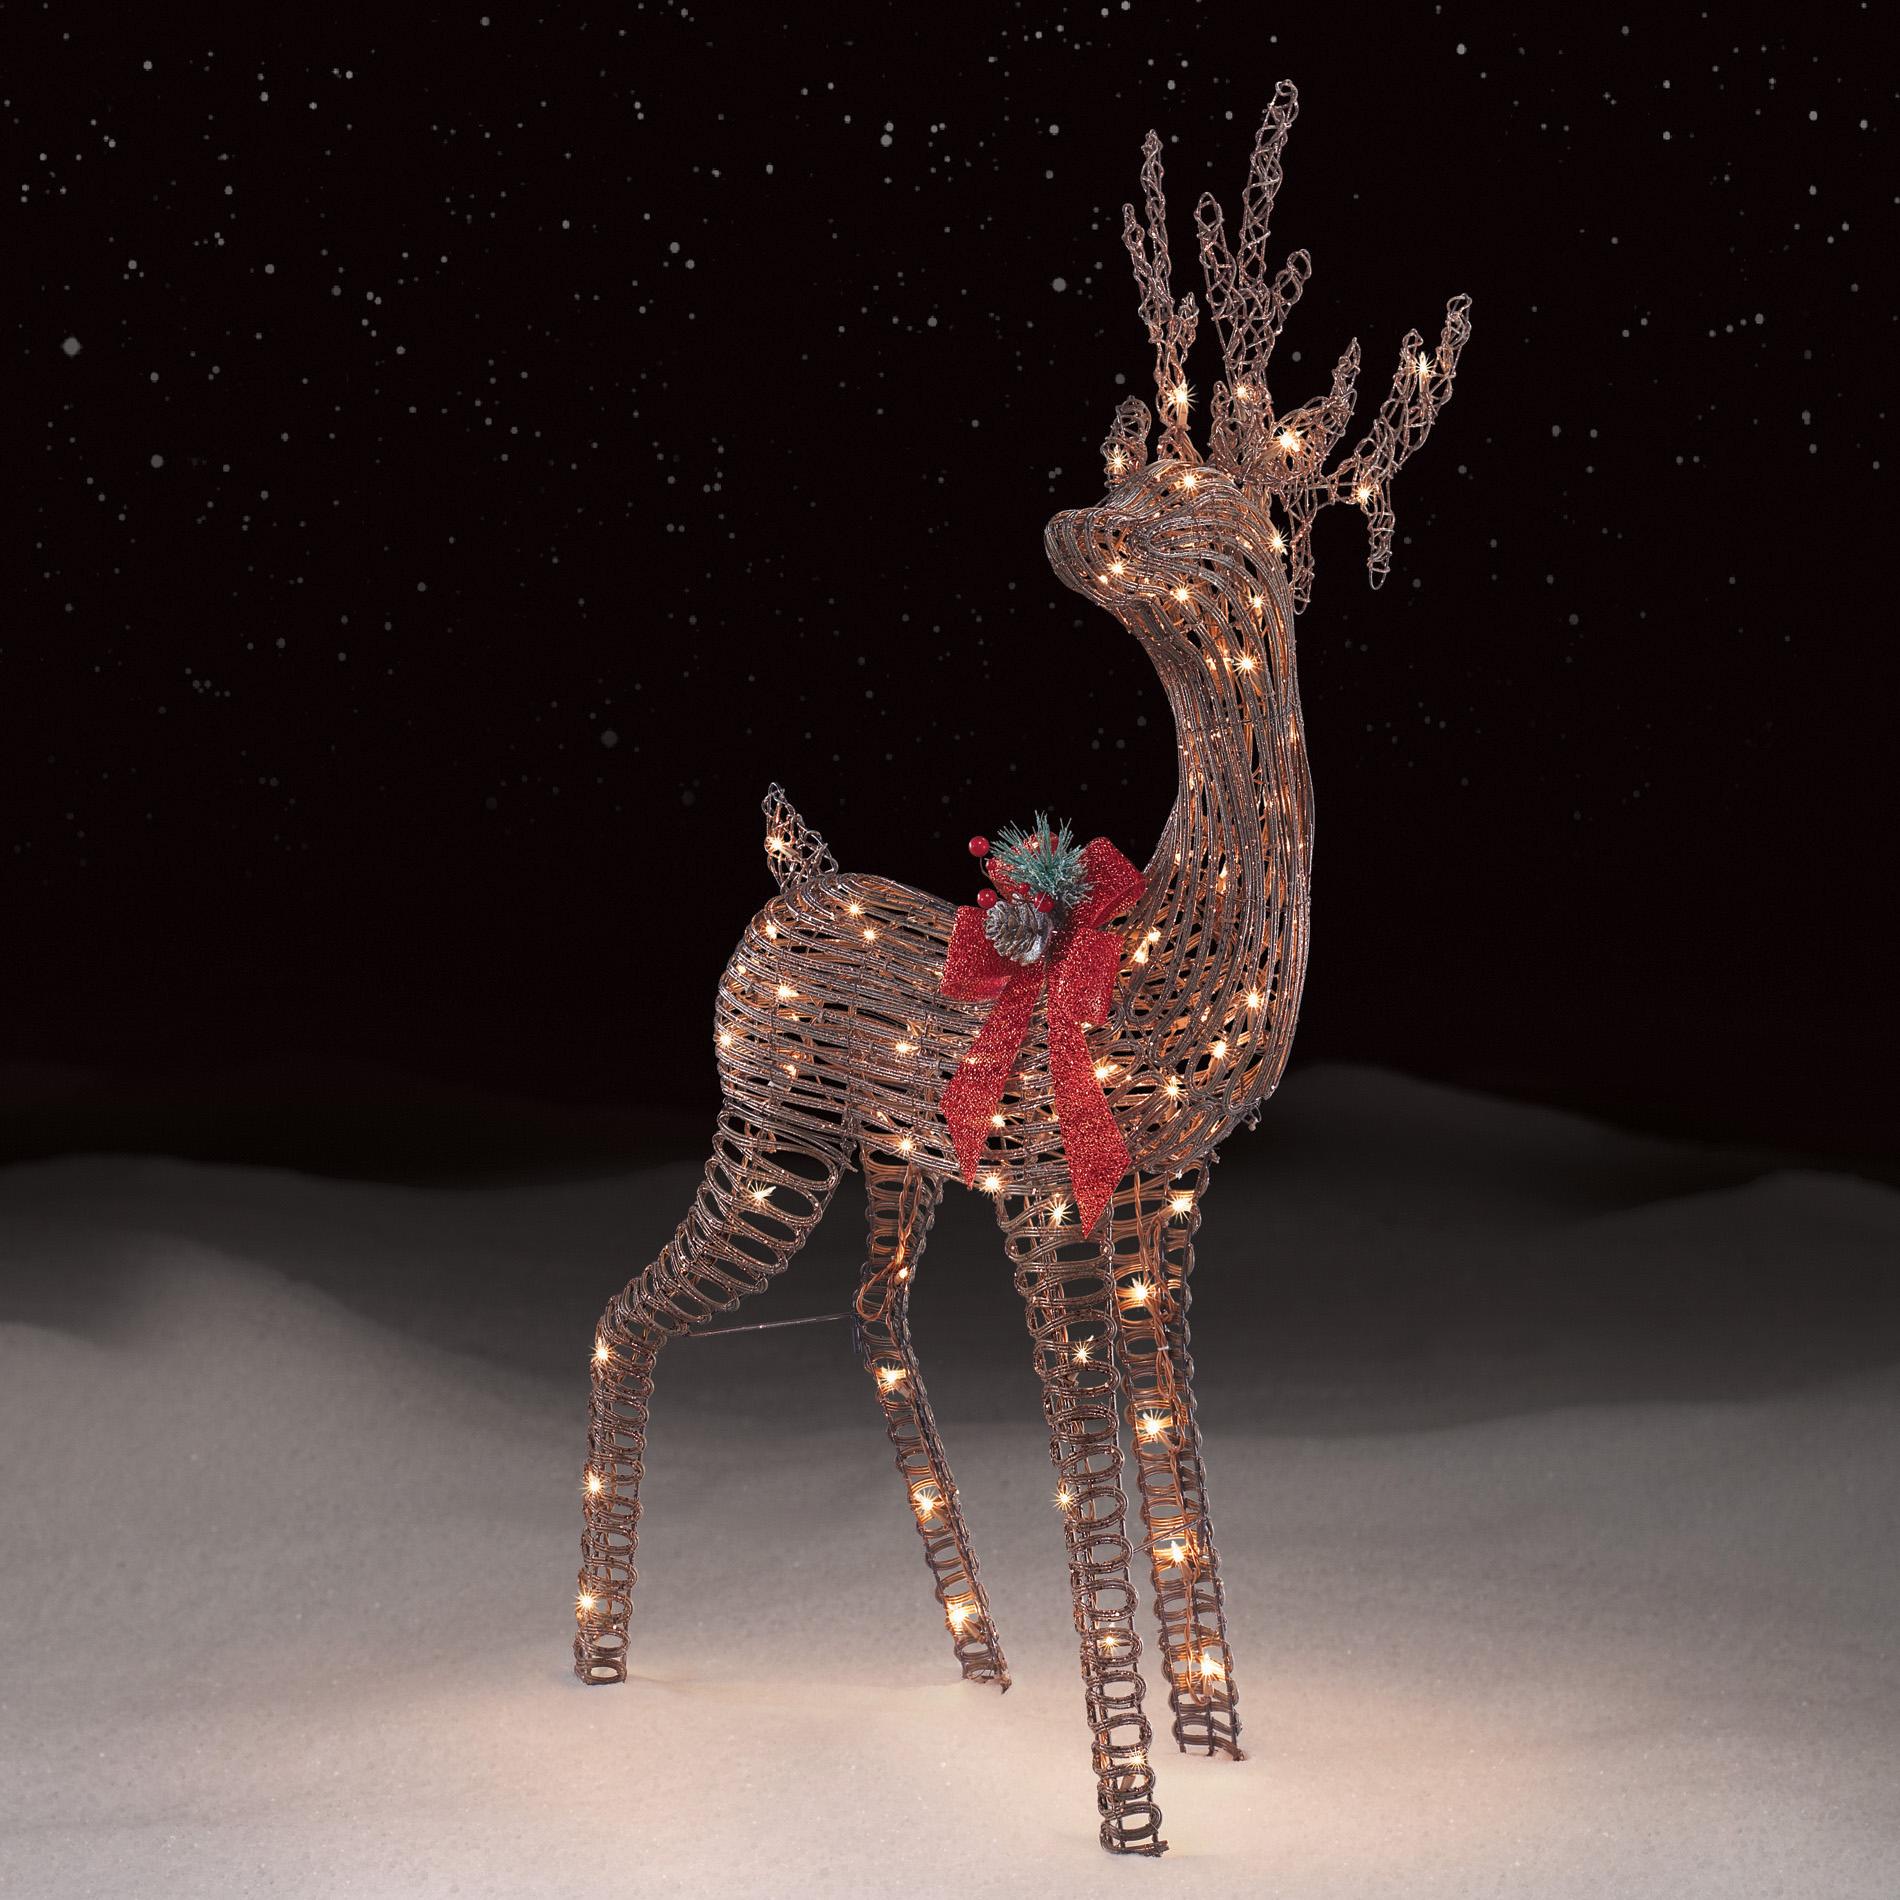 Christmas Deer Lawn Ornaments